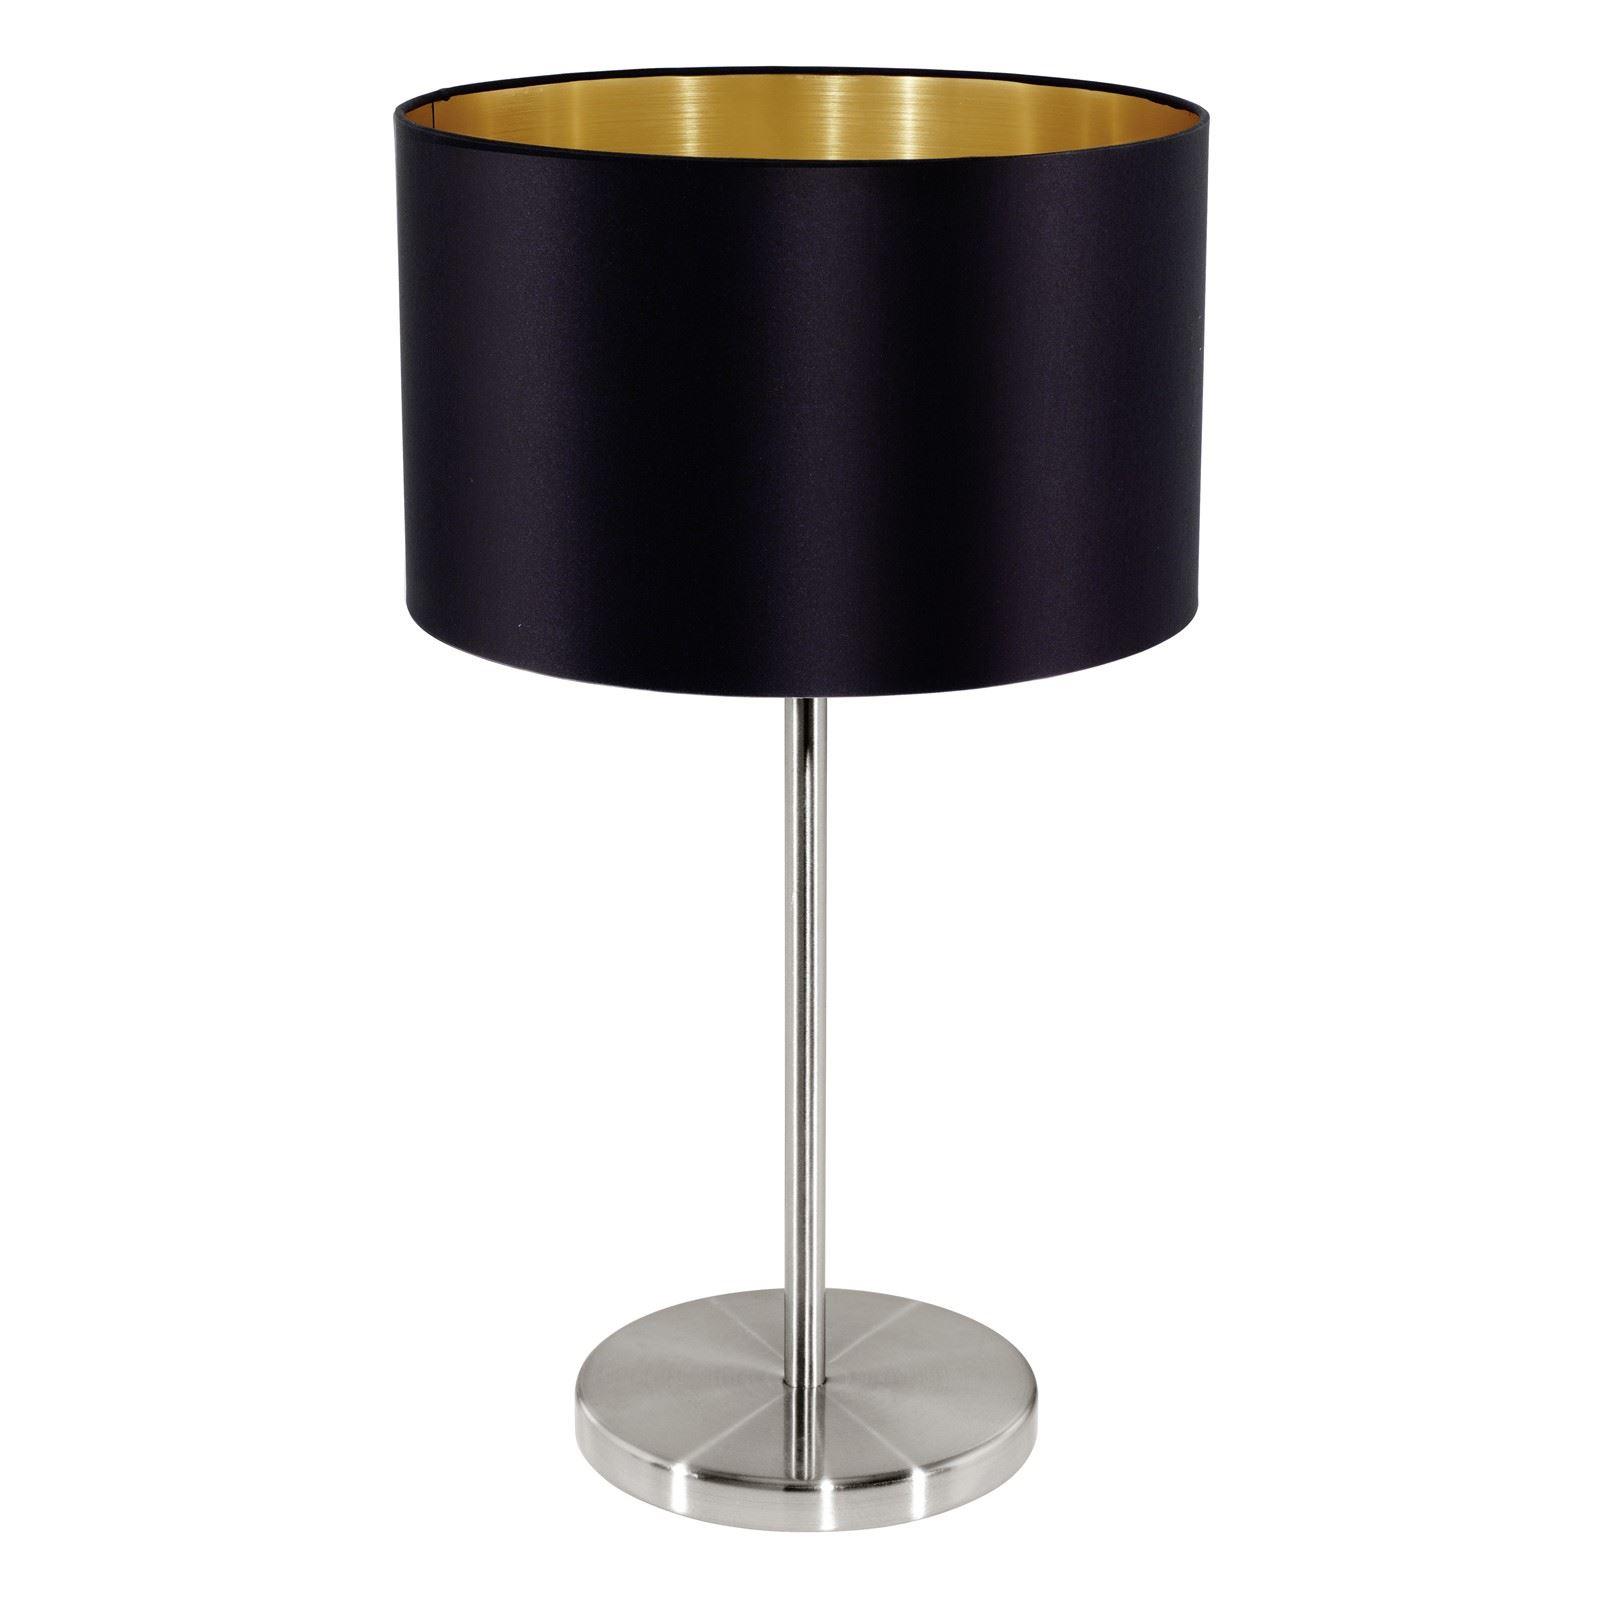 Maserlo Steel Satin Nickel Table Lamp 1 Light E27 Fabric Matt Black Shade